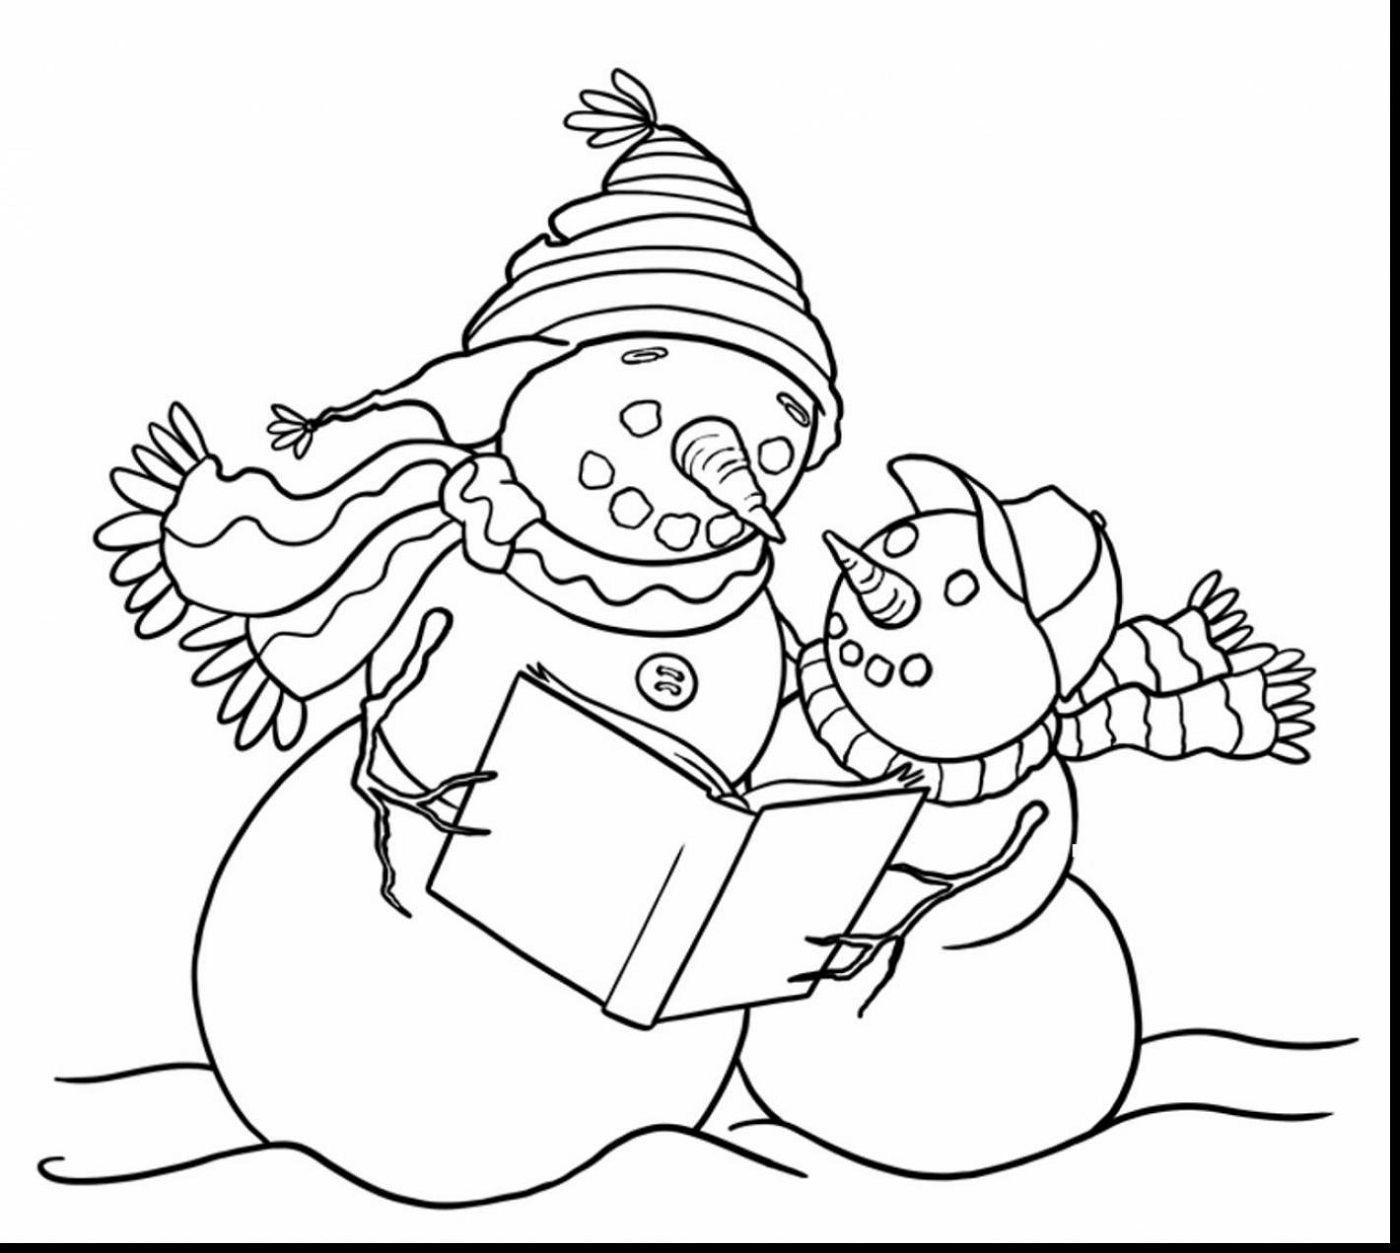 Dltk Crafts Printable Printable christmas coloring pages